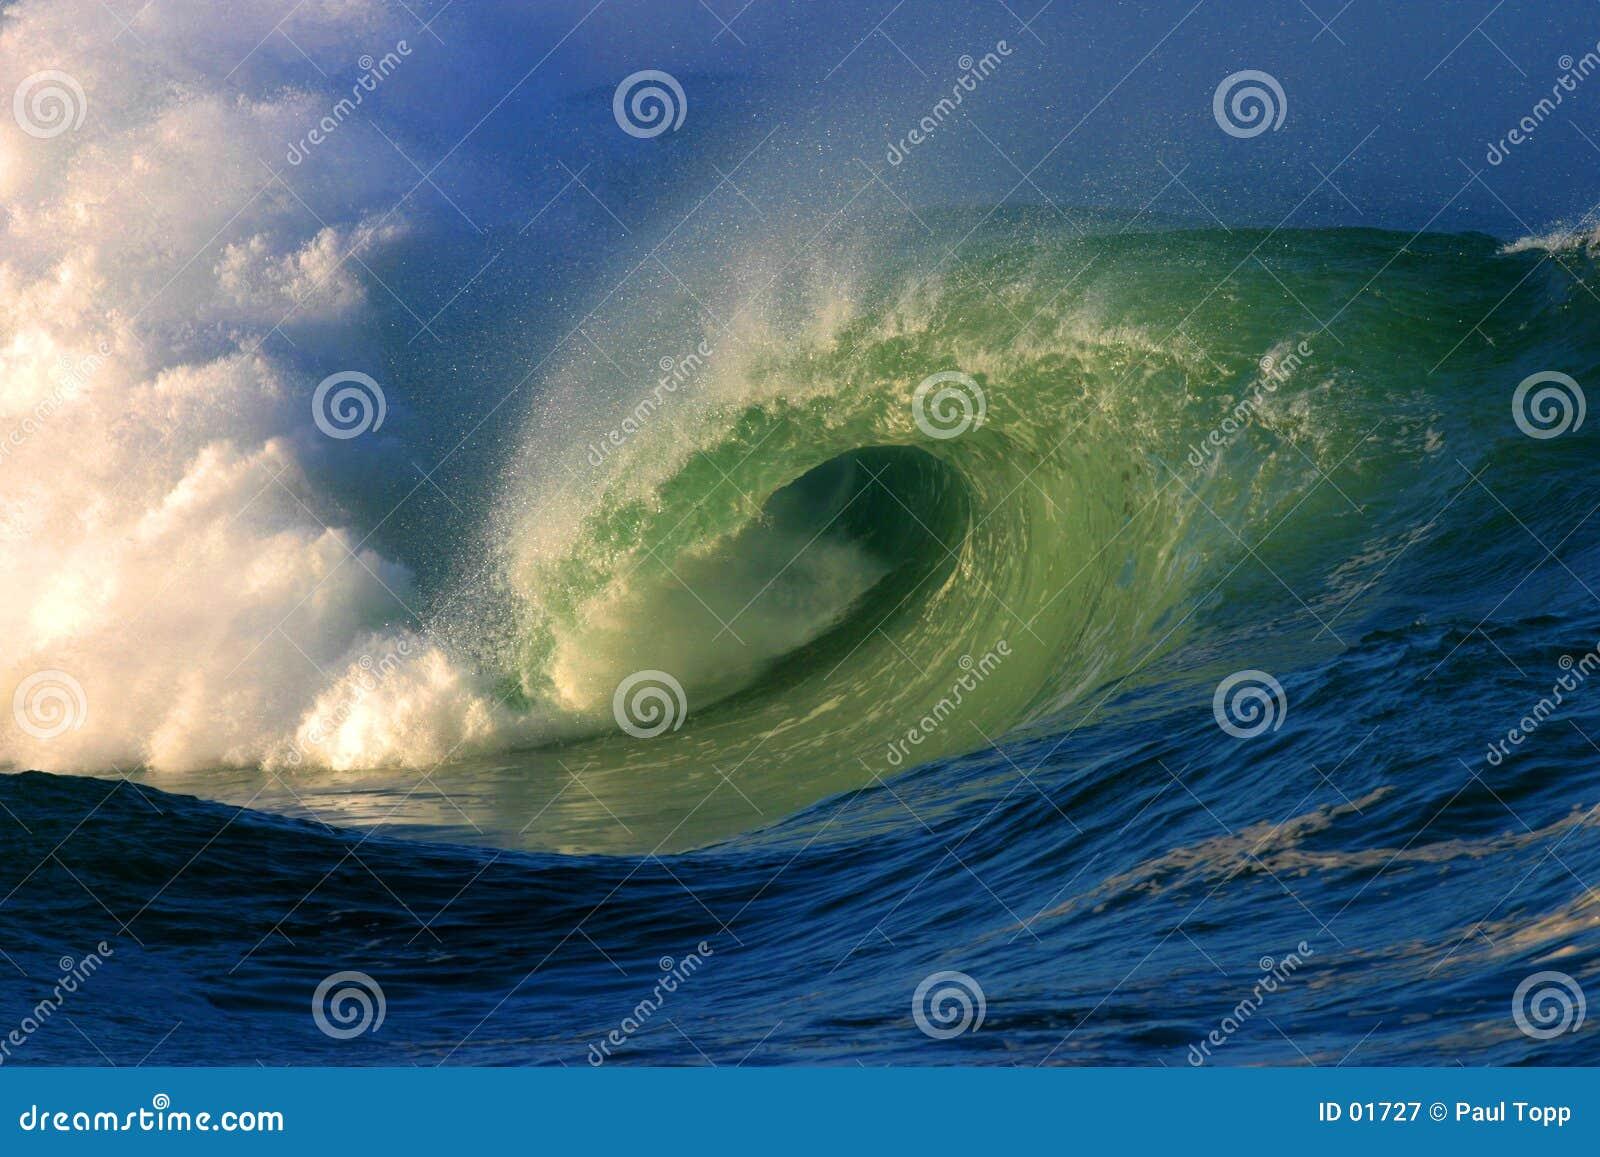 Shorebreak Surf Waves